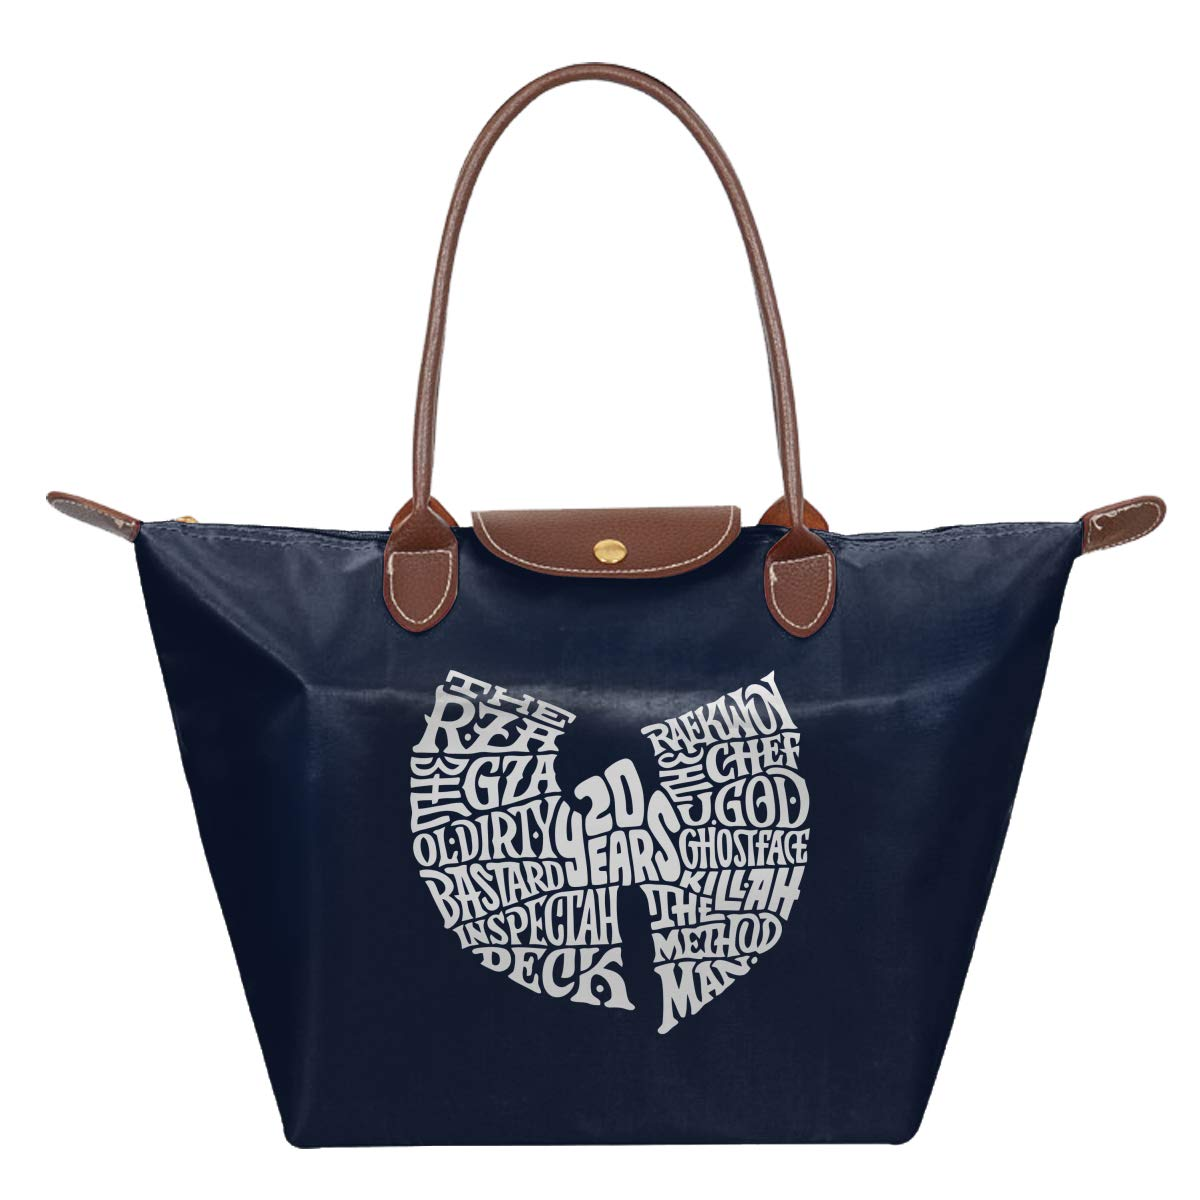 WU Tang Clan 20 Years Anniversary ODB Brooklyn Zoo Hip Hop Legends 90s 36 Chambers Music Waterproof Leather Folded Messenger Nylon Bag Travel Tote Hopping Folding School Handbags